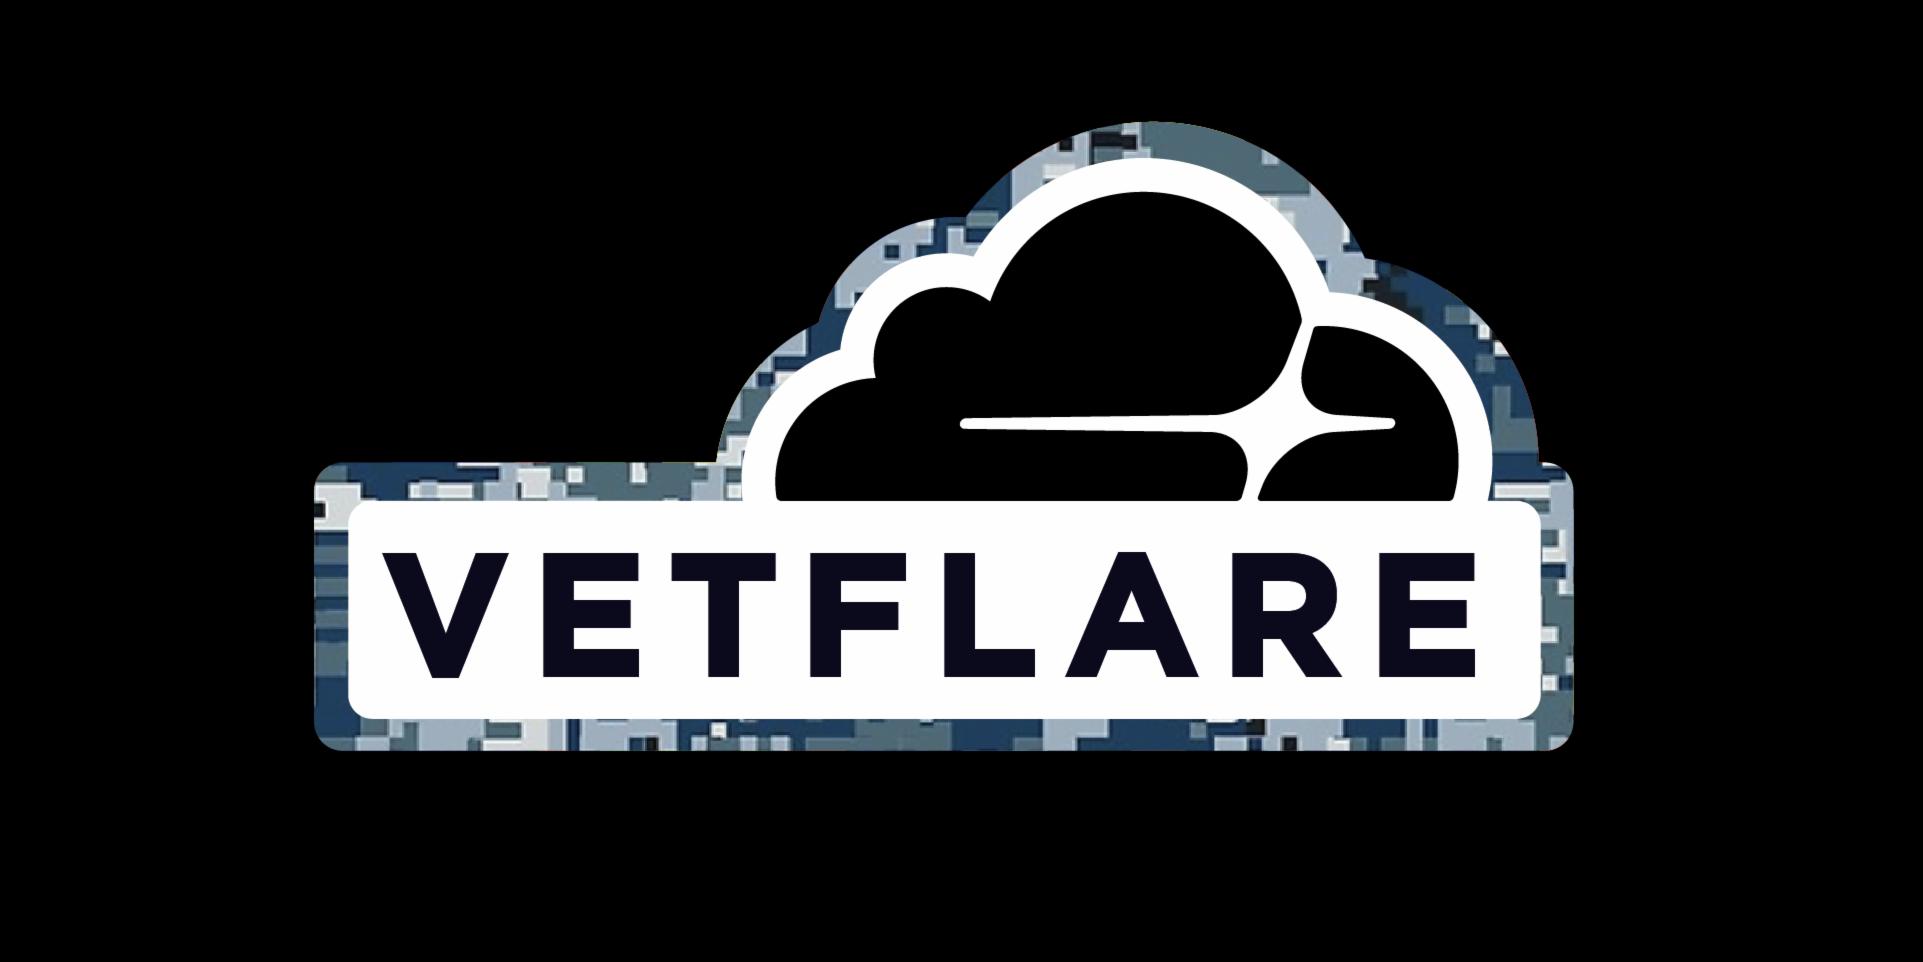 Vetflare logo